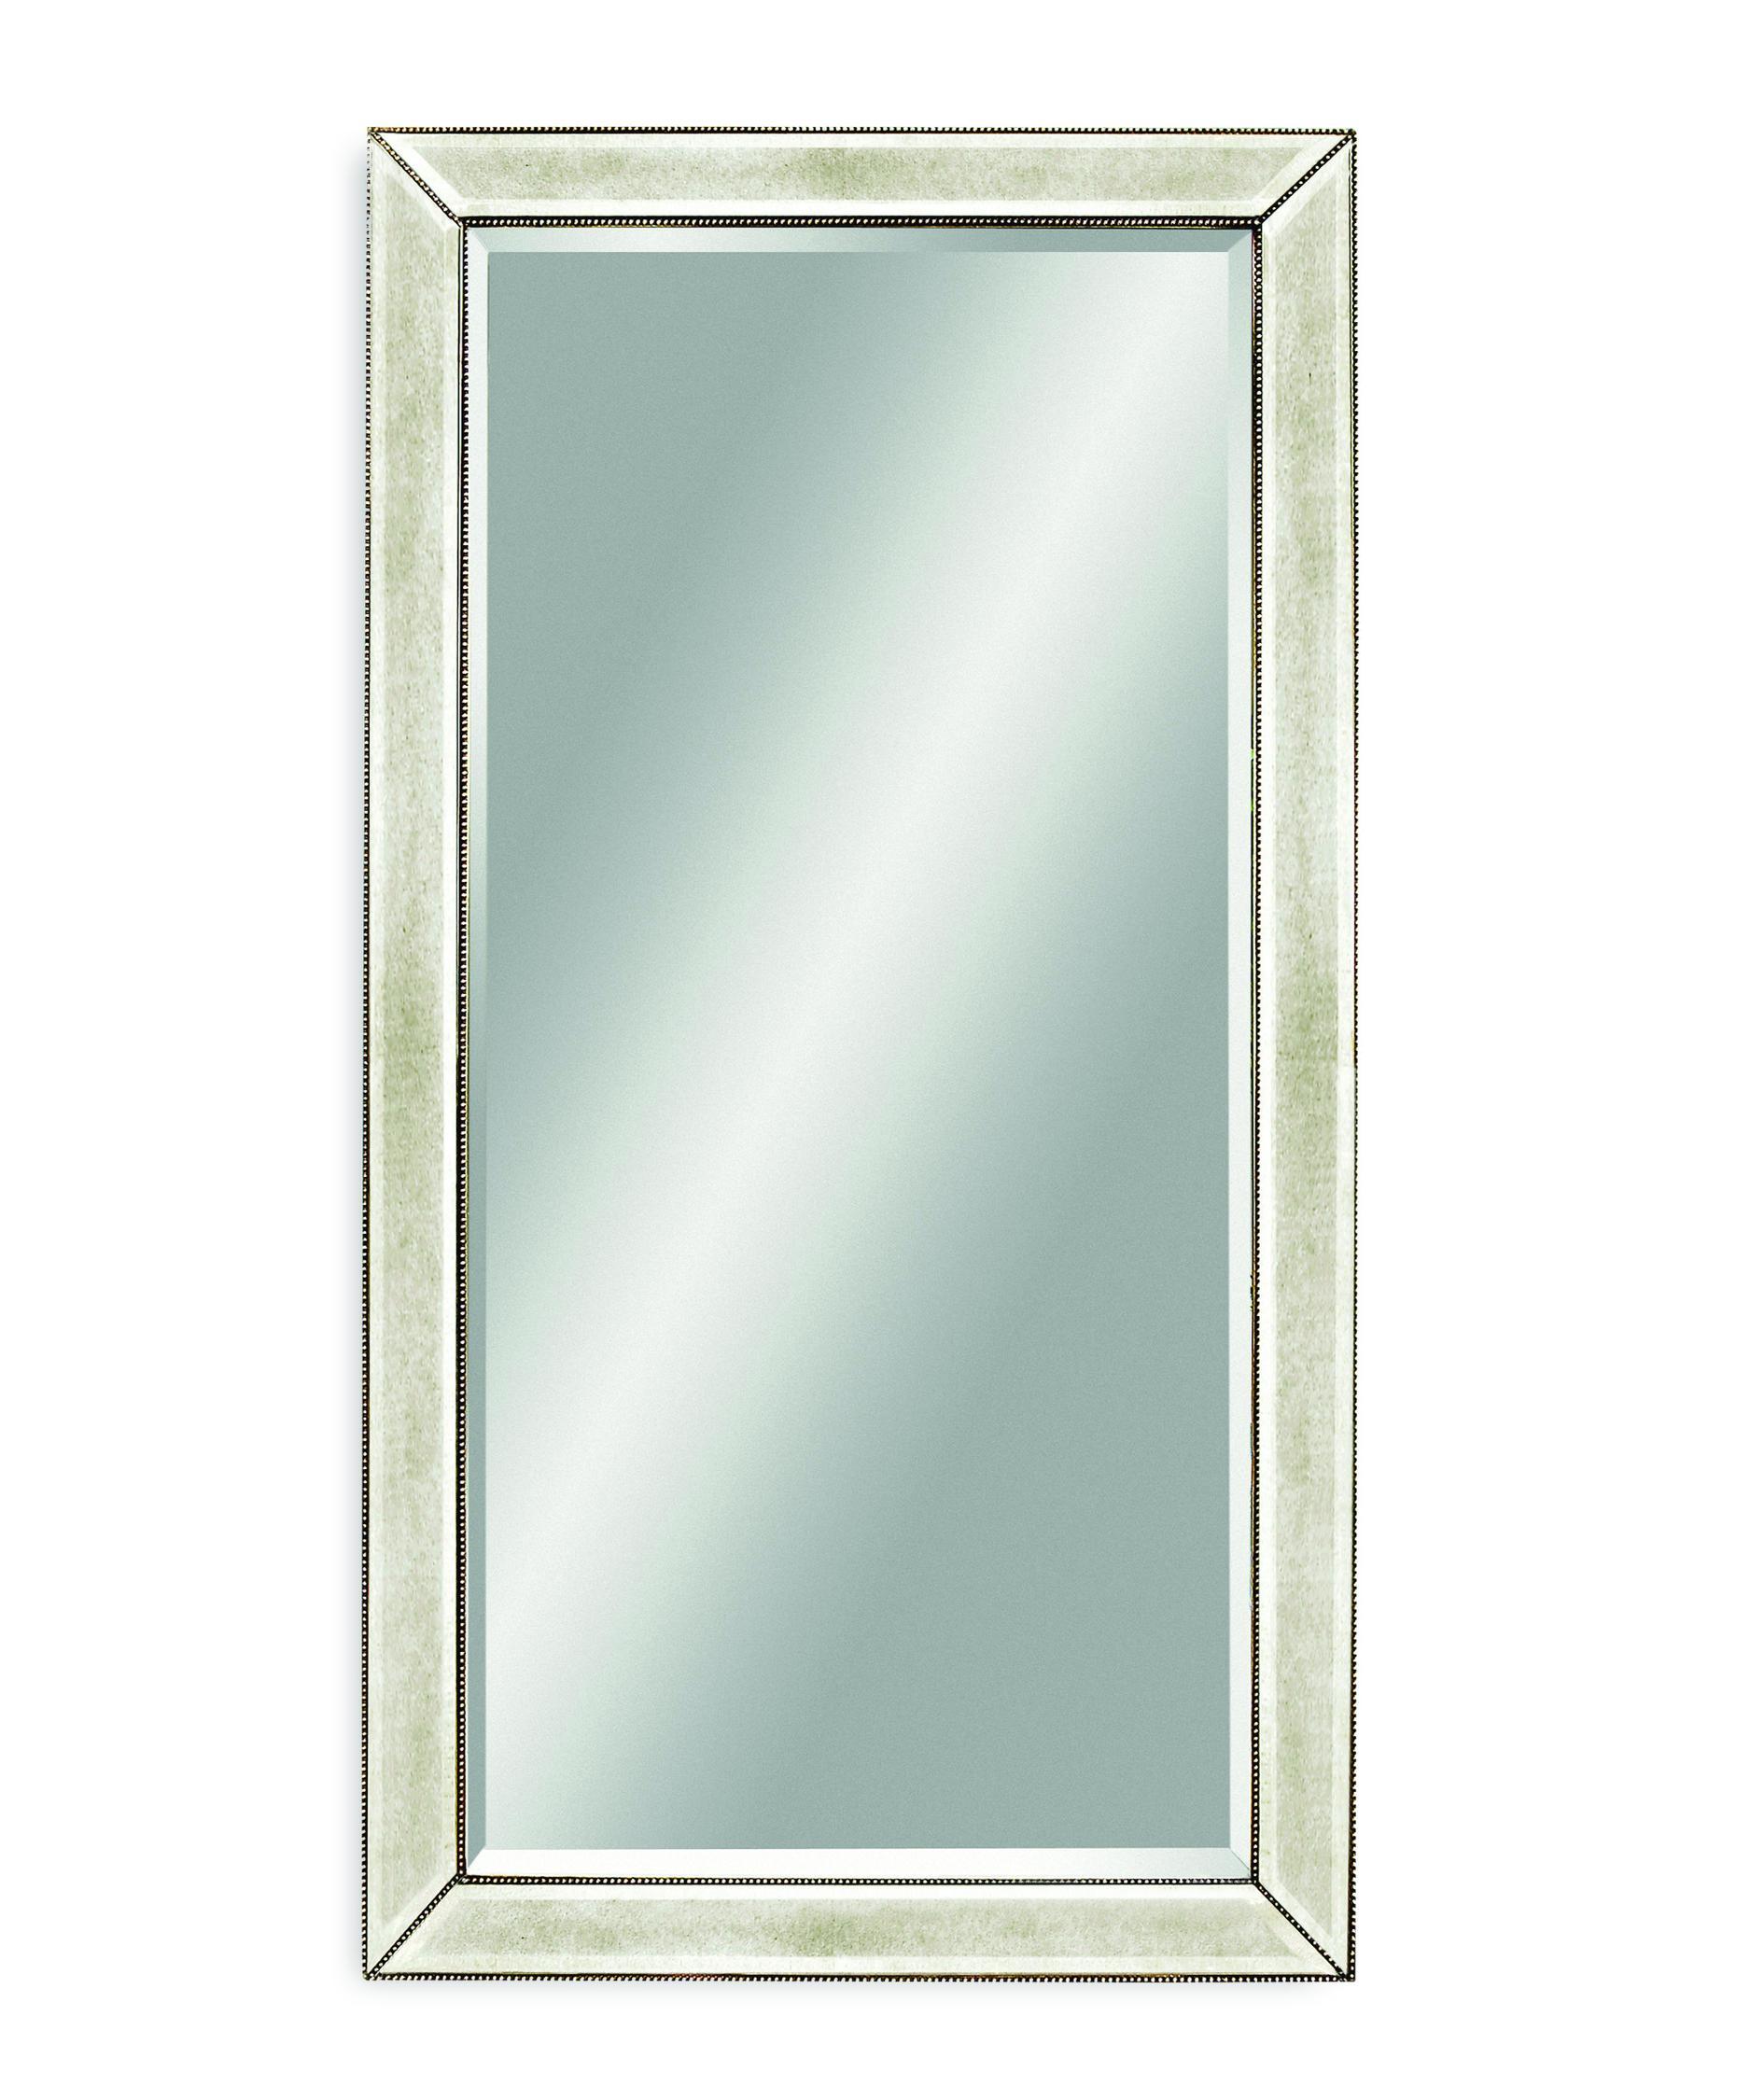 Bassett Mirror Company M2546b Beaded Mirror Capitol